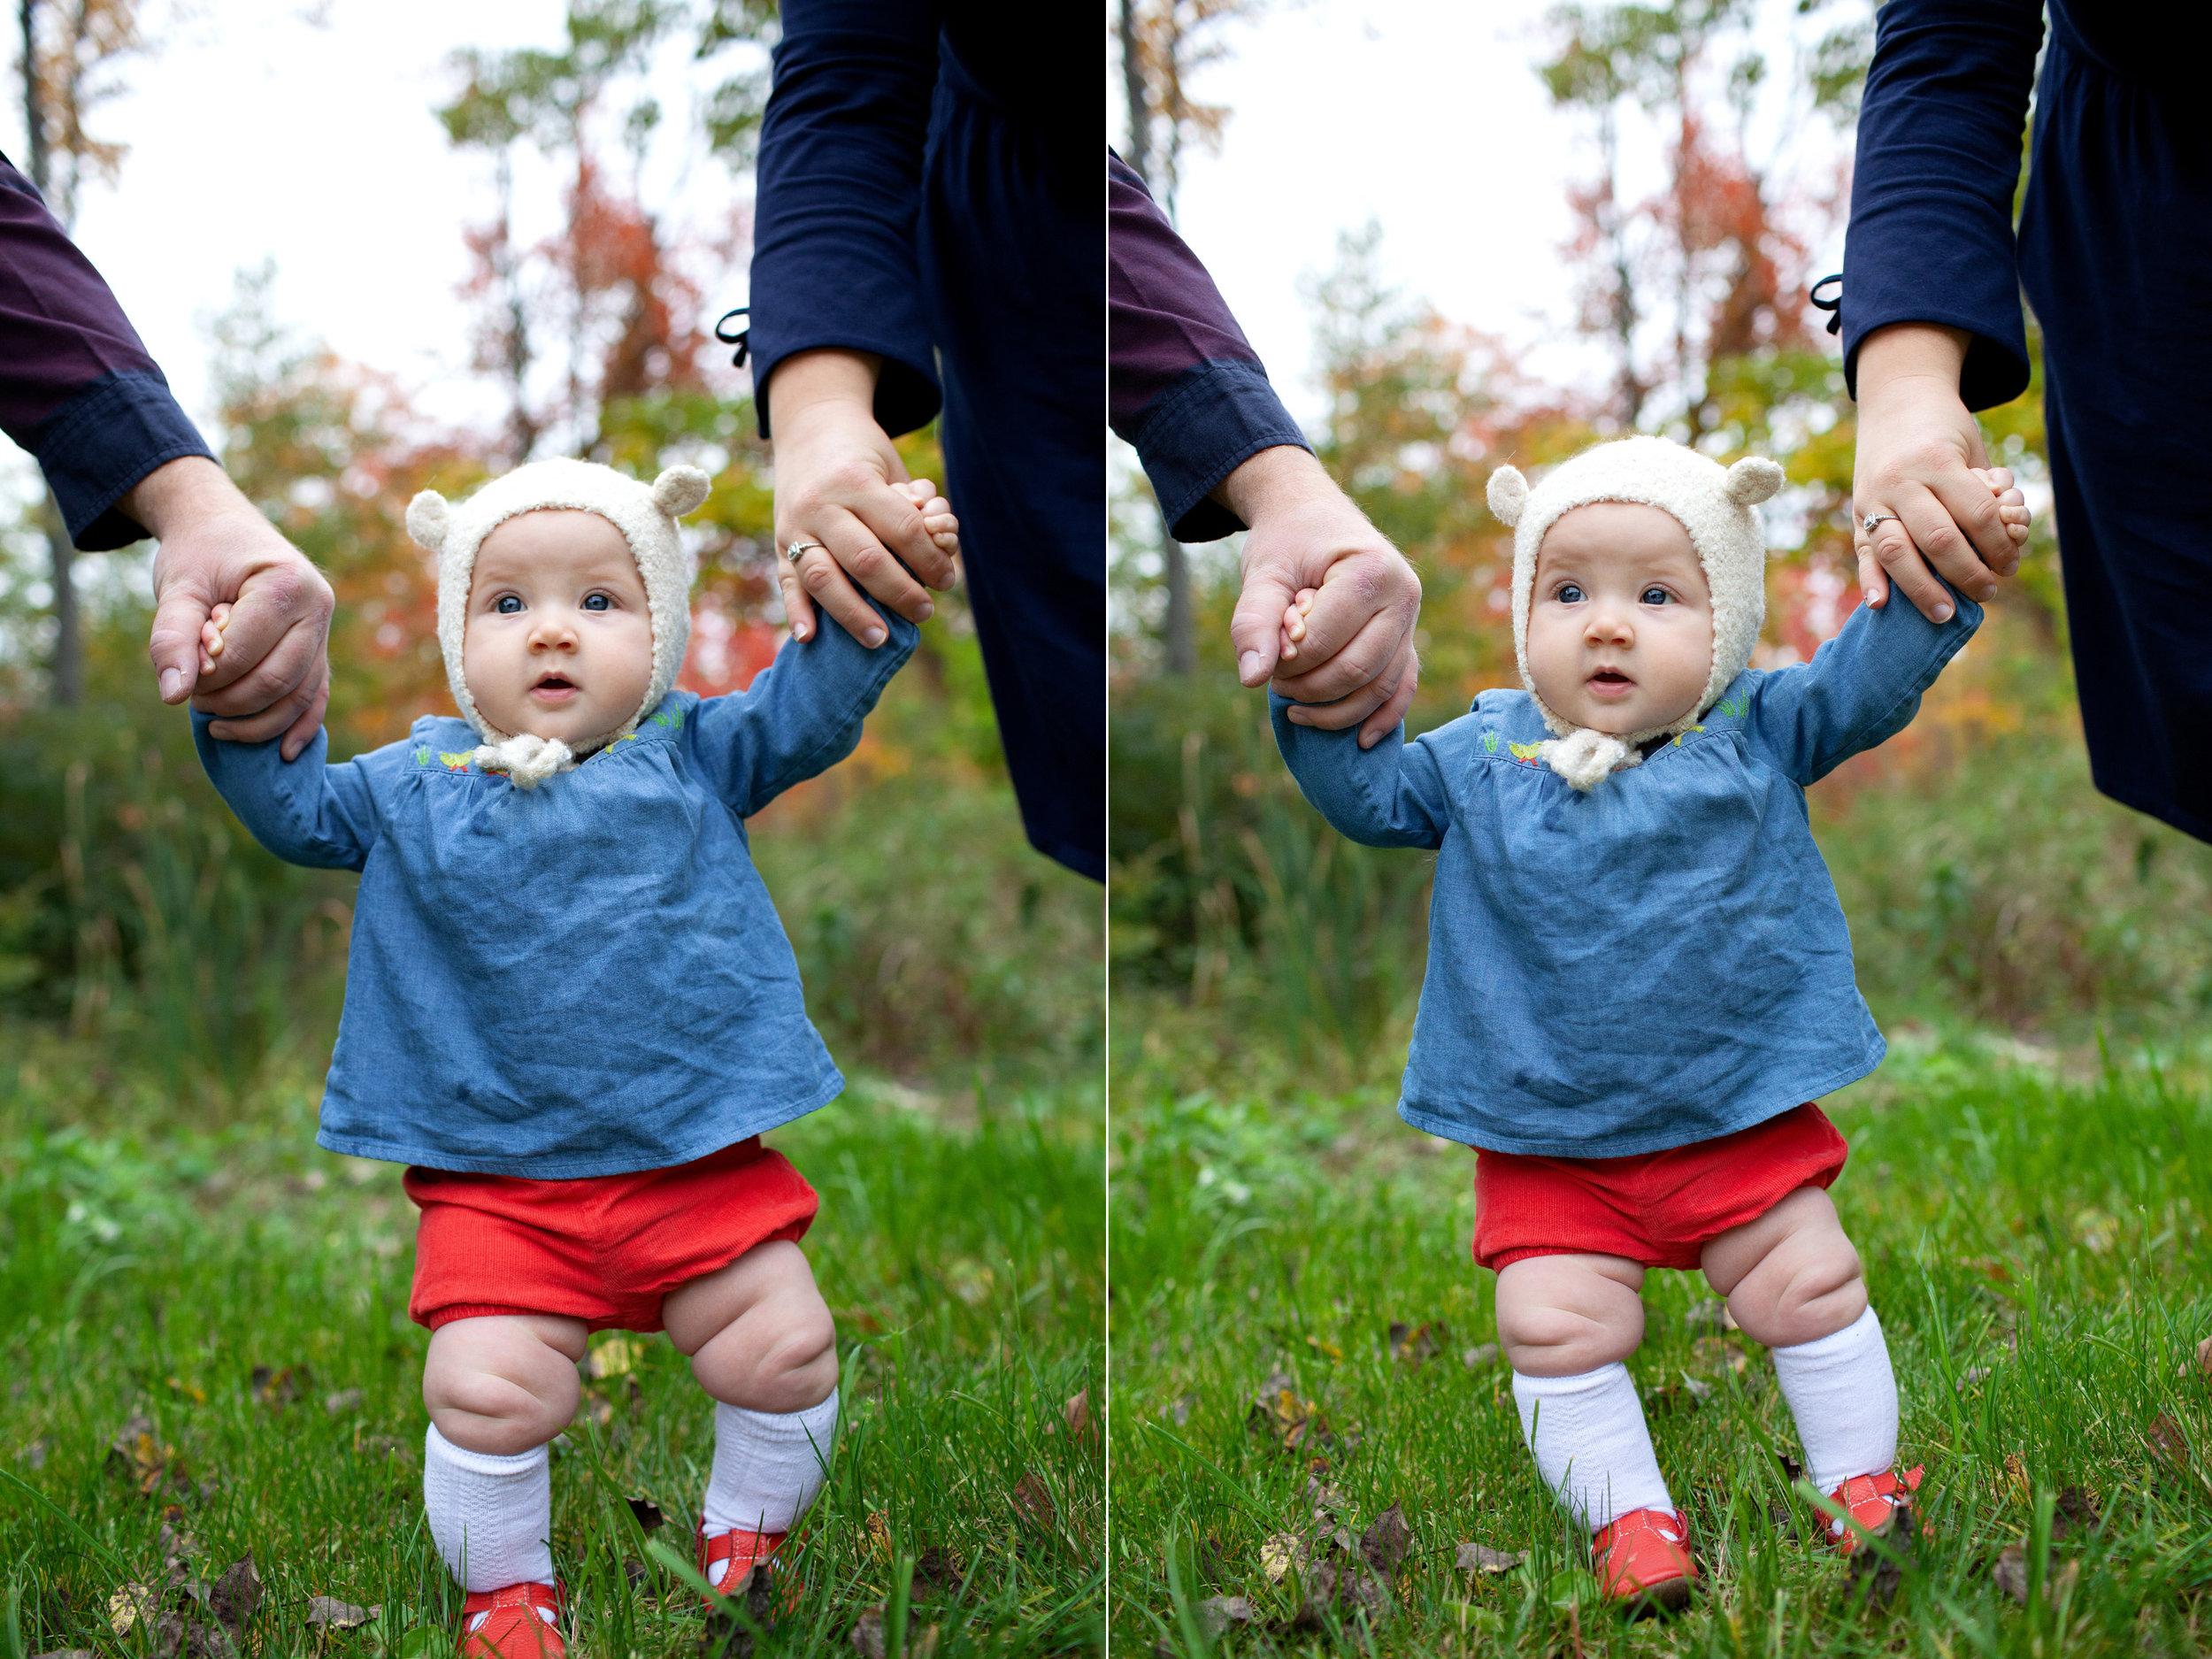 maine-baby-milestone-photographer-stepheney-collins-photography -43.jpg